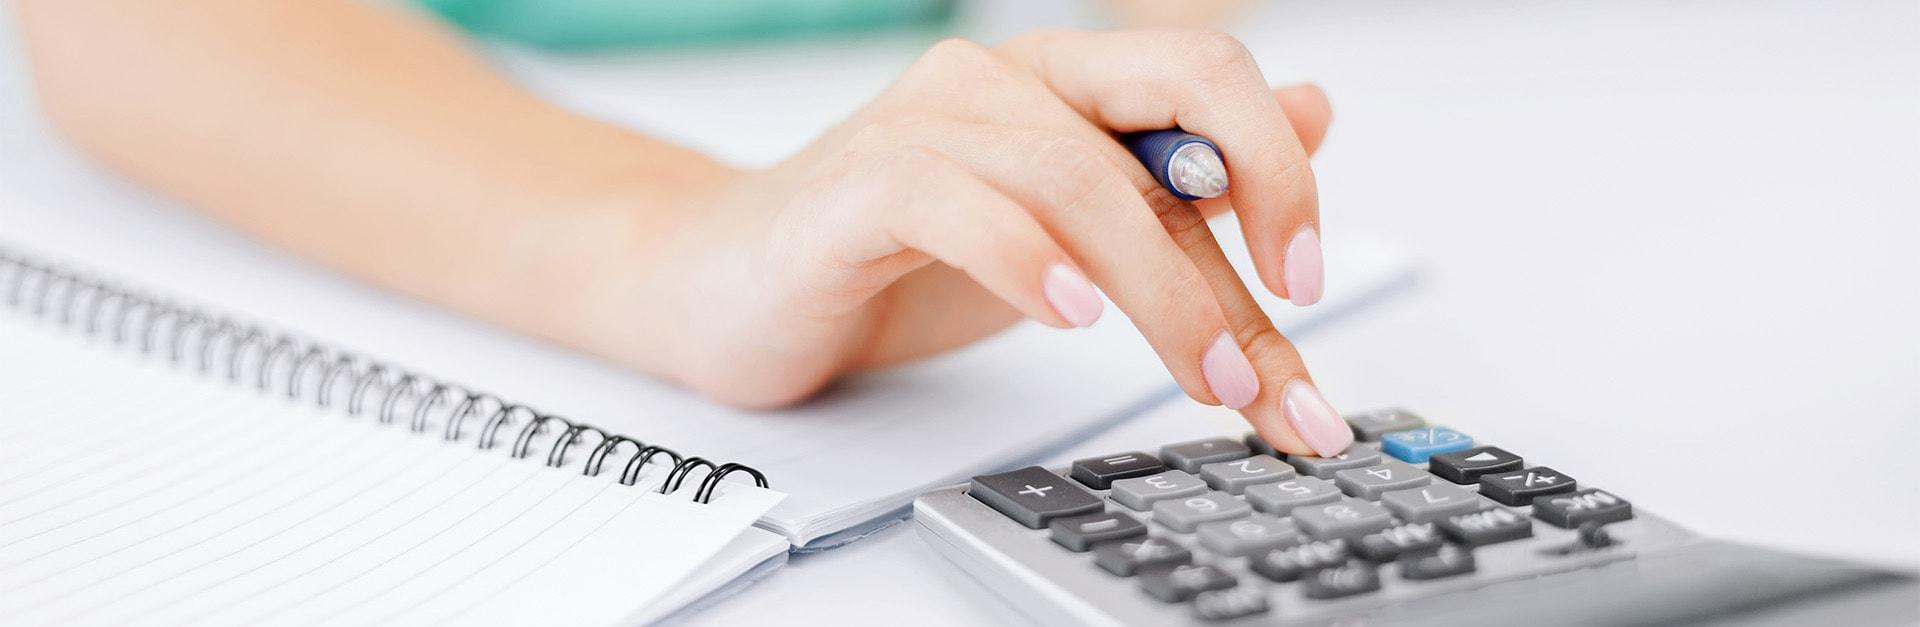 Debt Advisory Services woman debt advice calculator